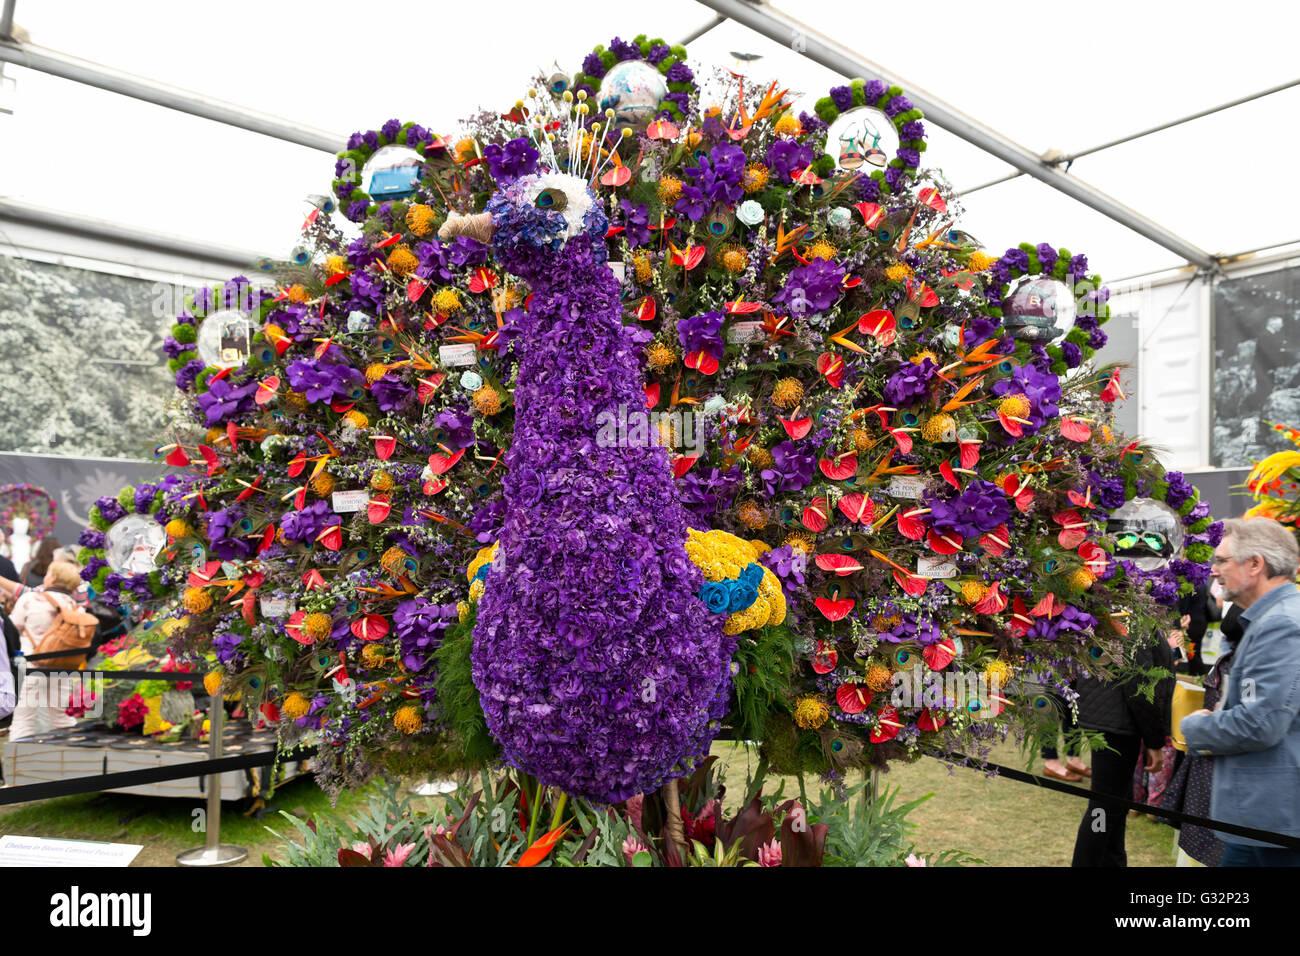 RHS Chelsea Flower Show 2016 Great Pavilion Flower Peacock Stock Photo